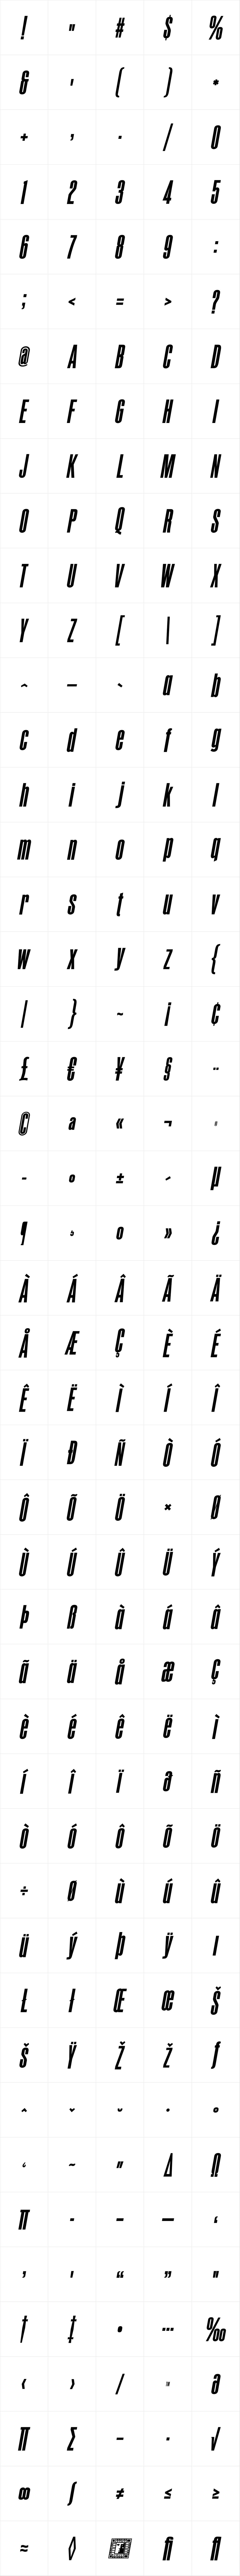 Xheighter Condensed Italic